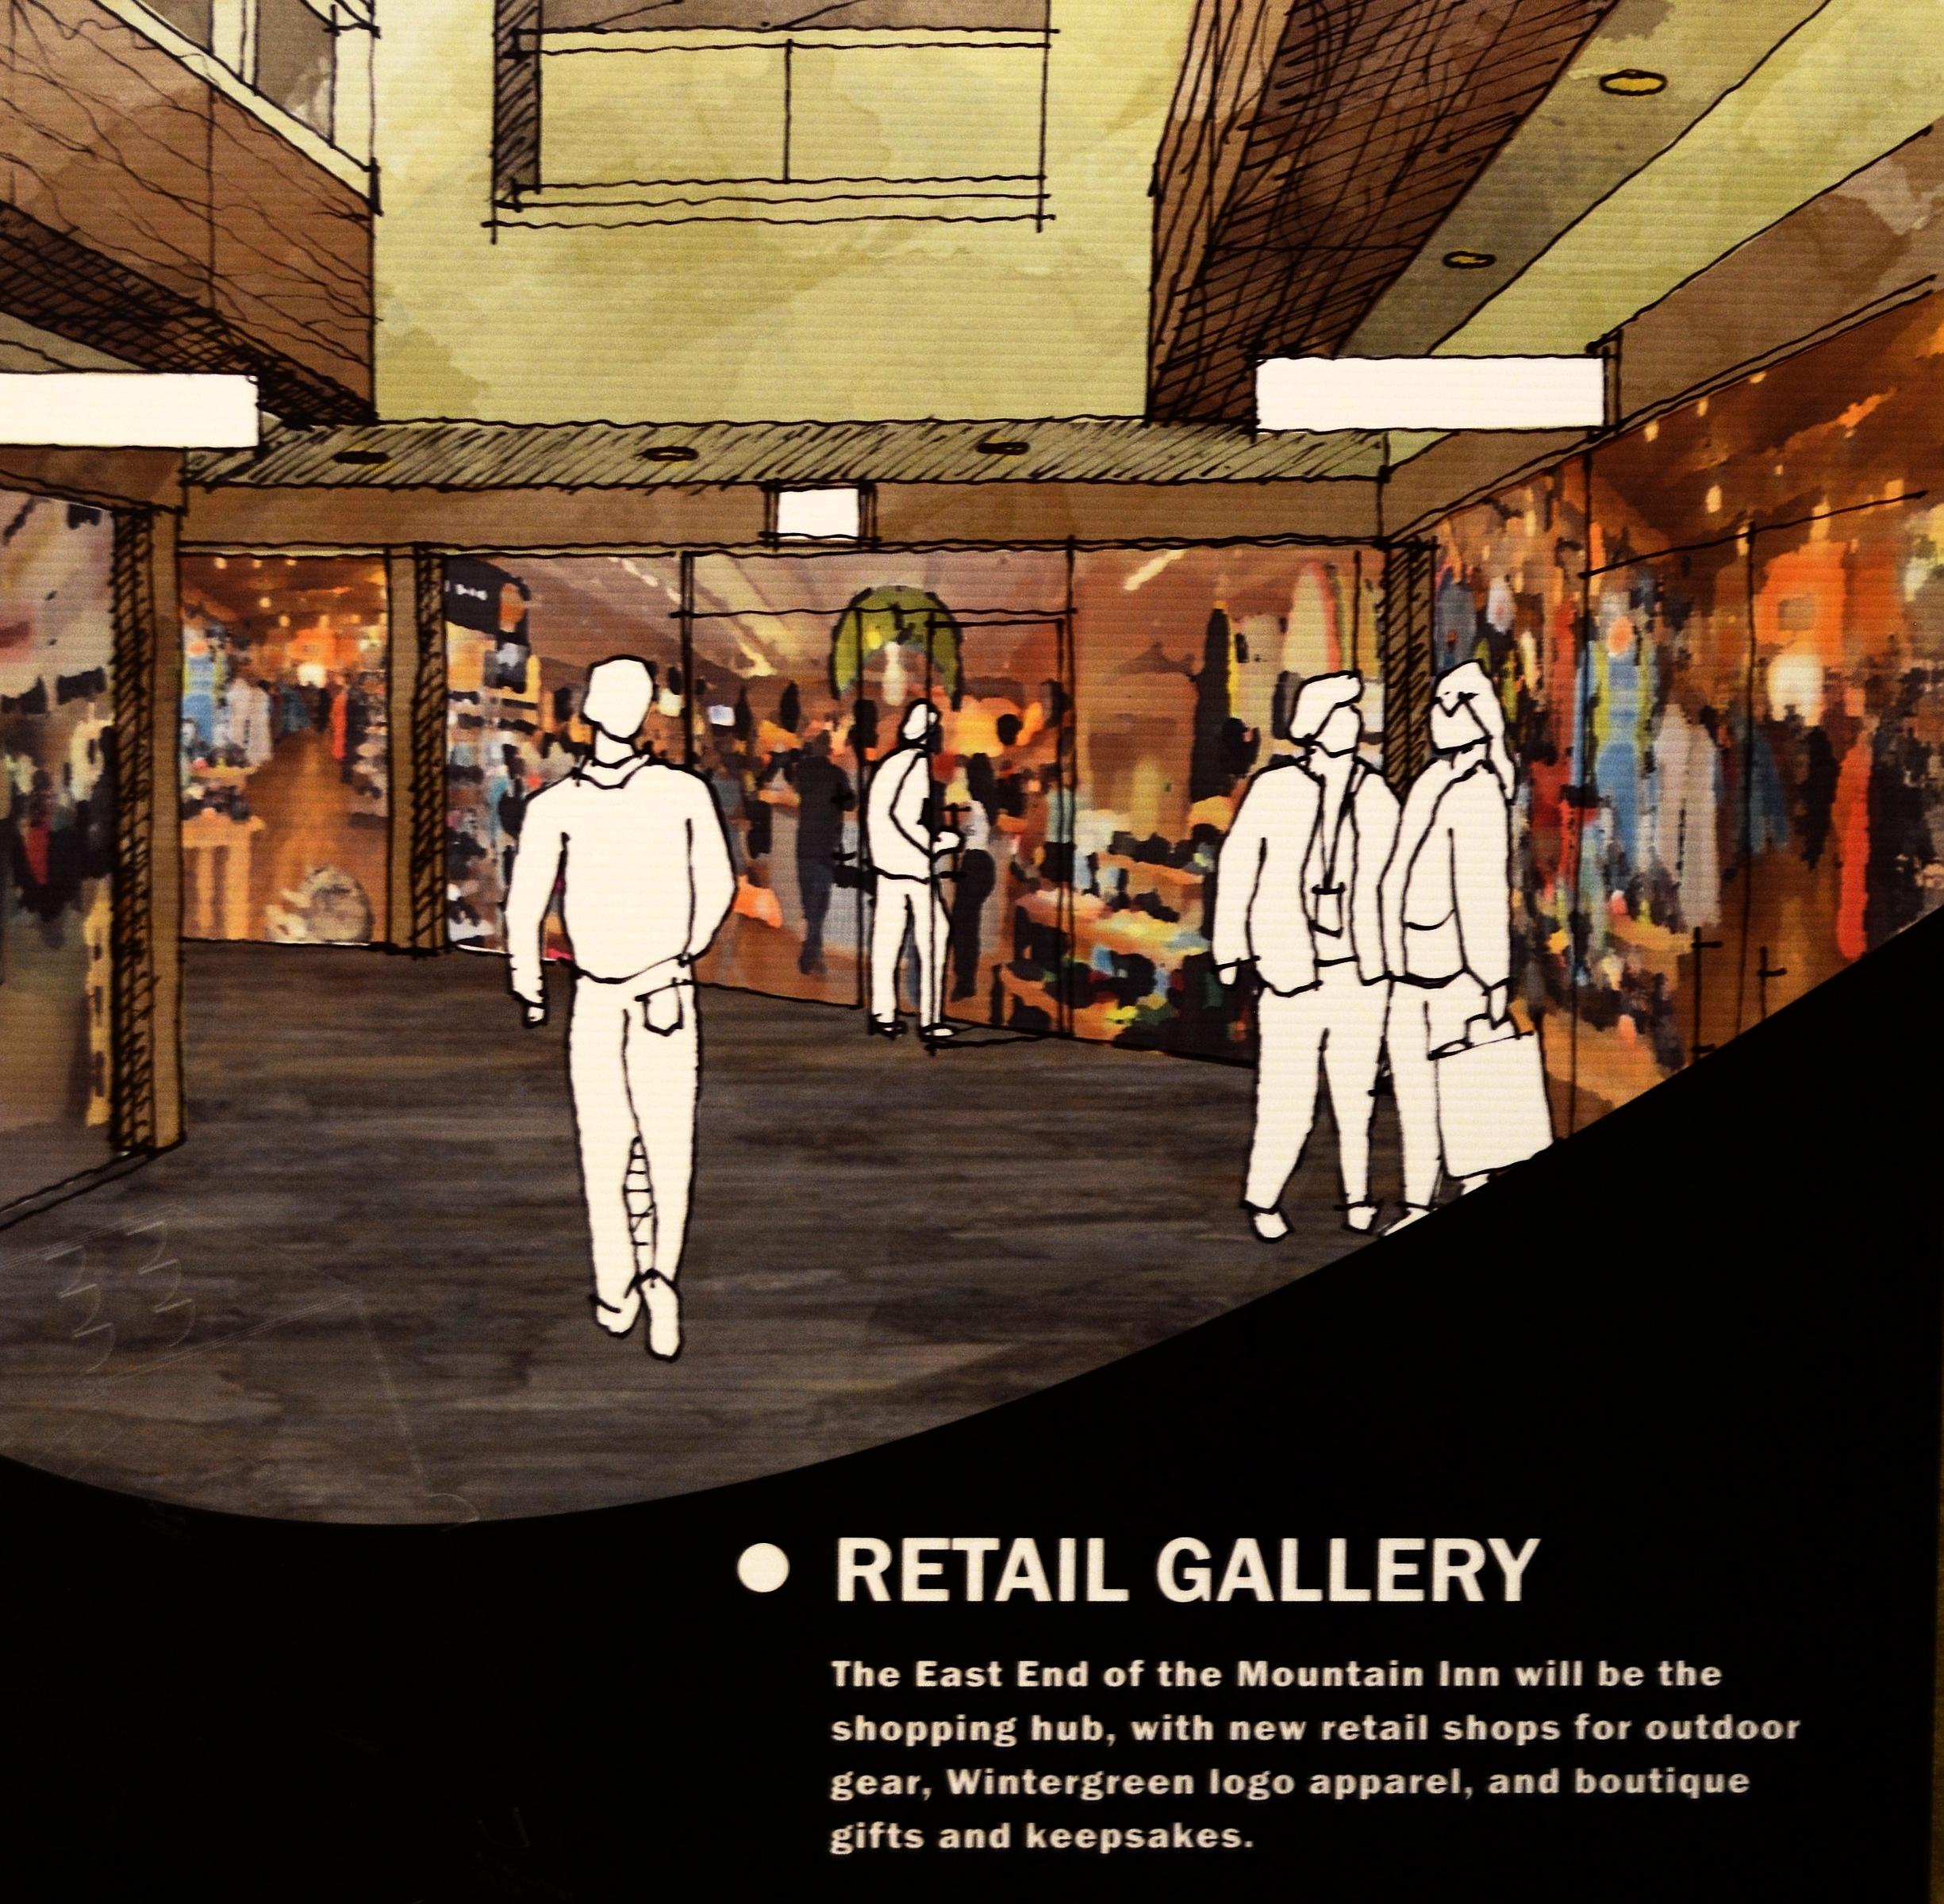 retail gallery poster 1.JPG